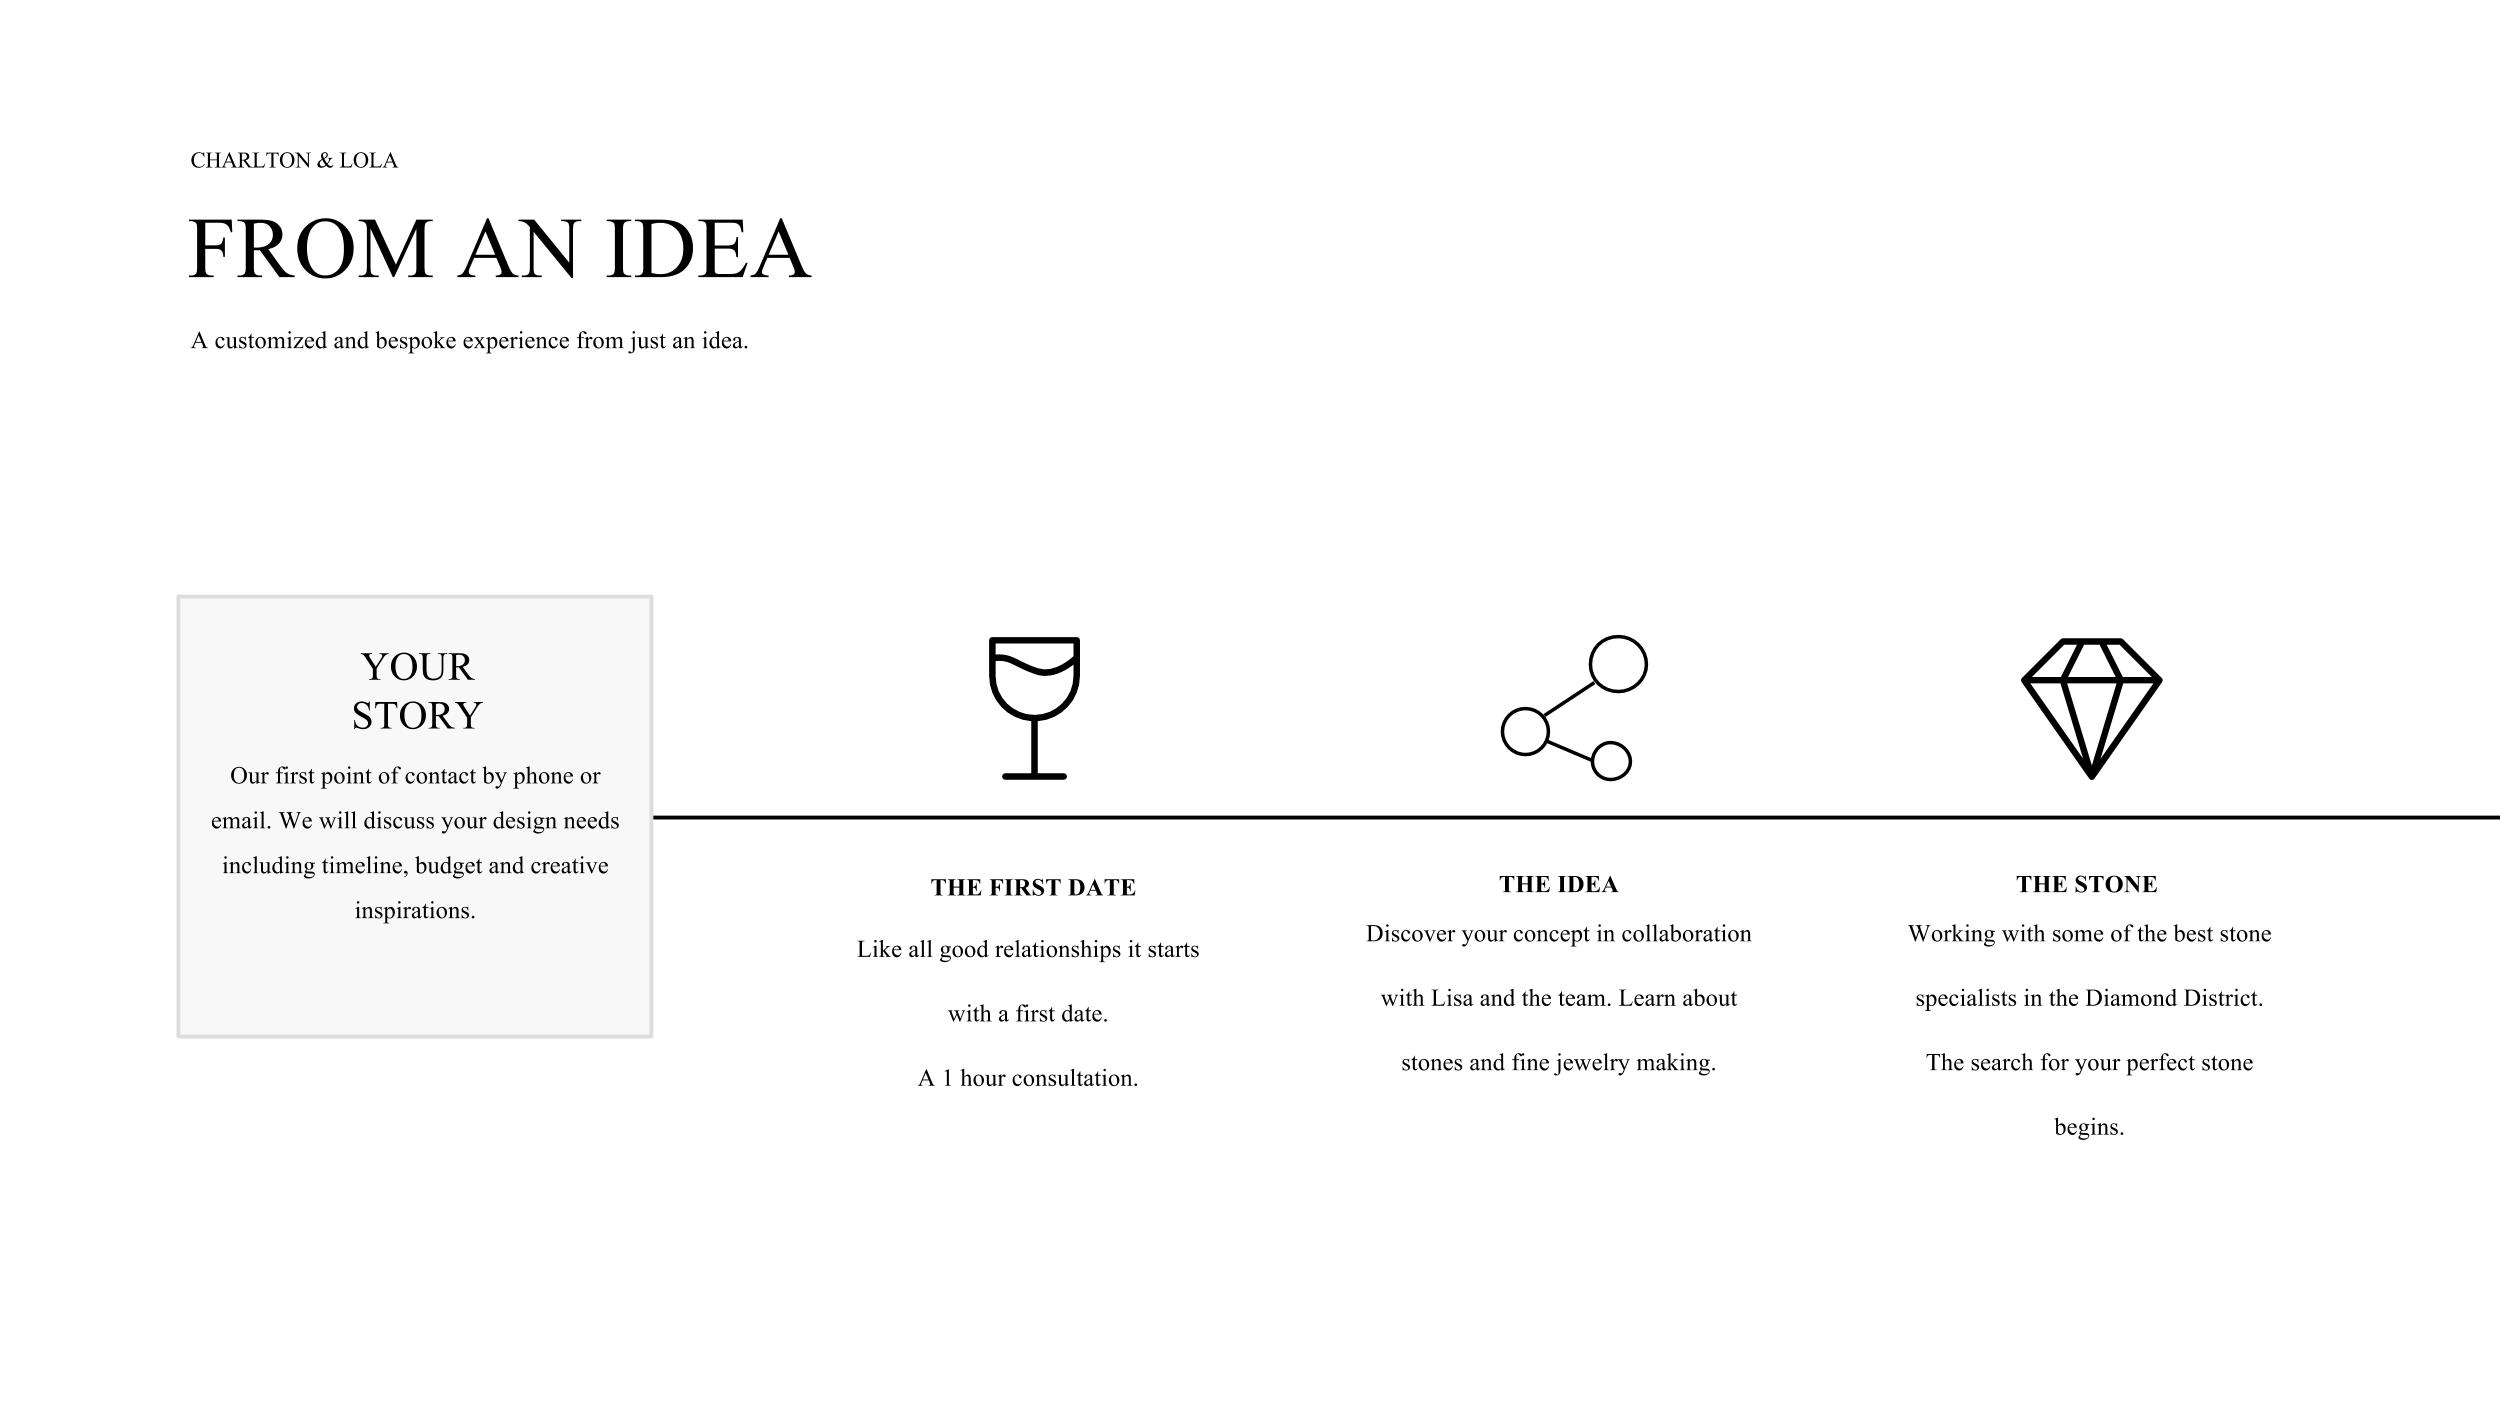 CHARLTON & LOLA Wedding Design Process